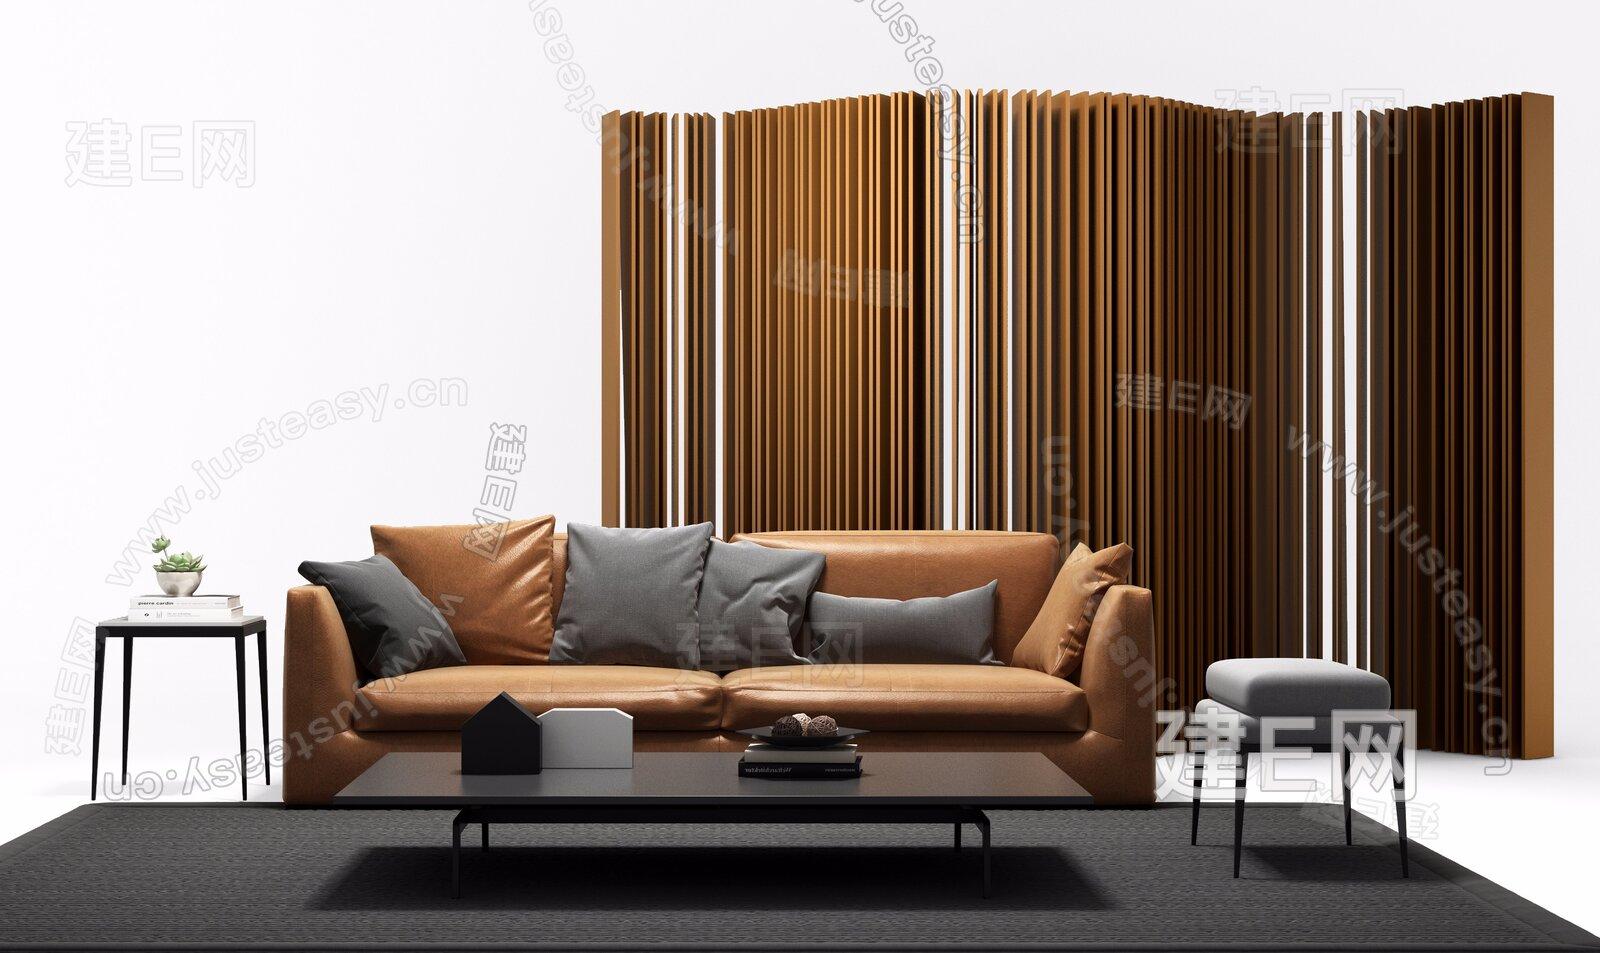 B&B Italia 现代沙发茶几组合3d模型